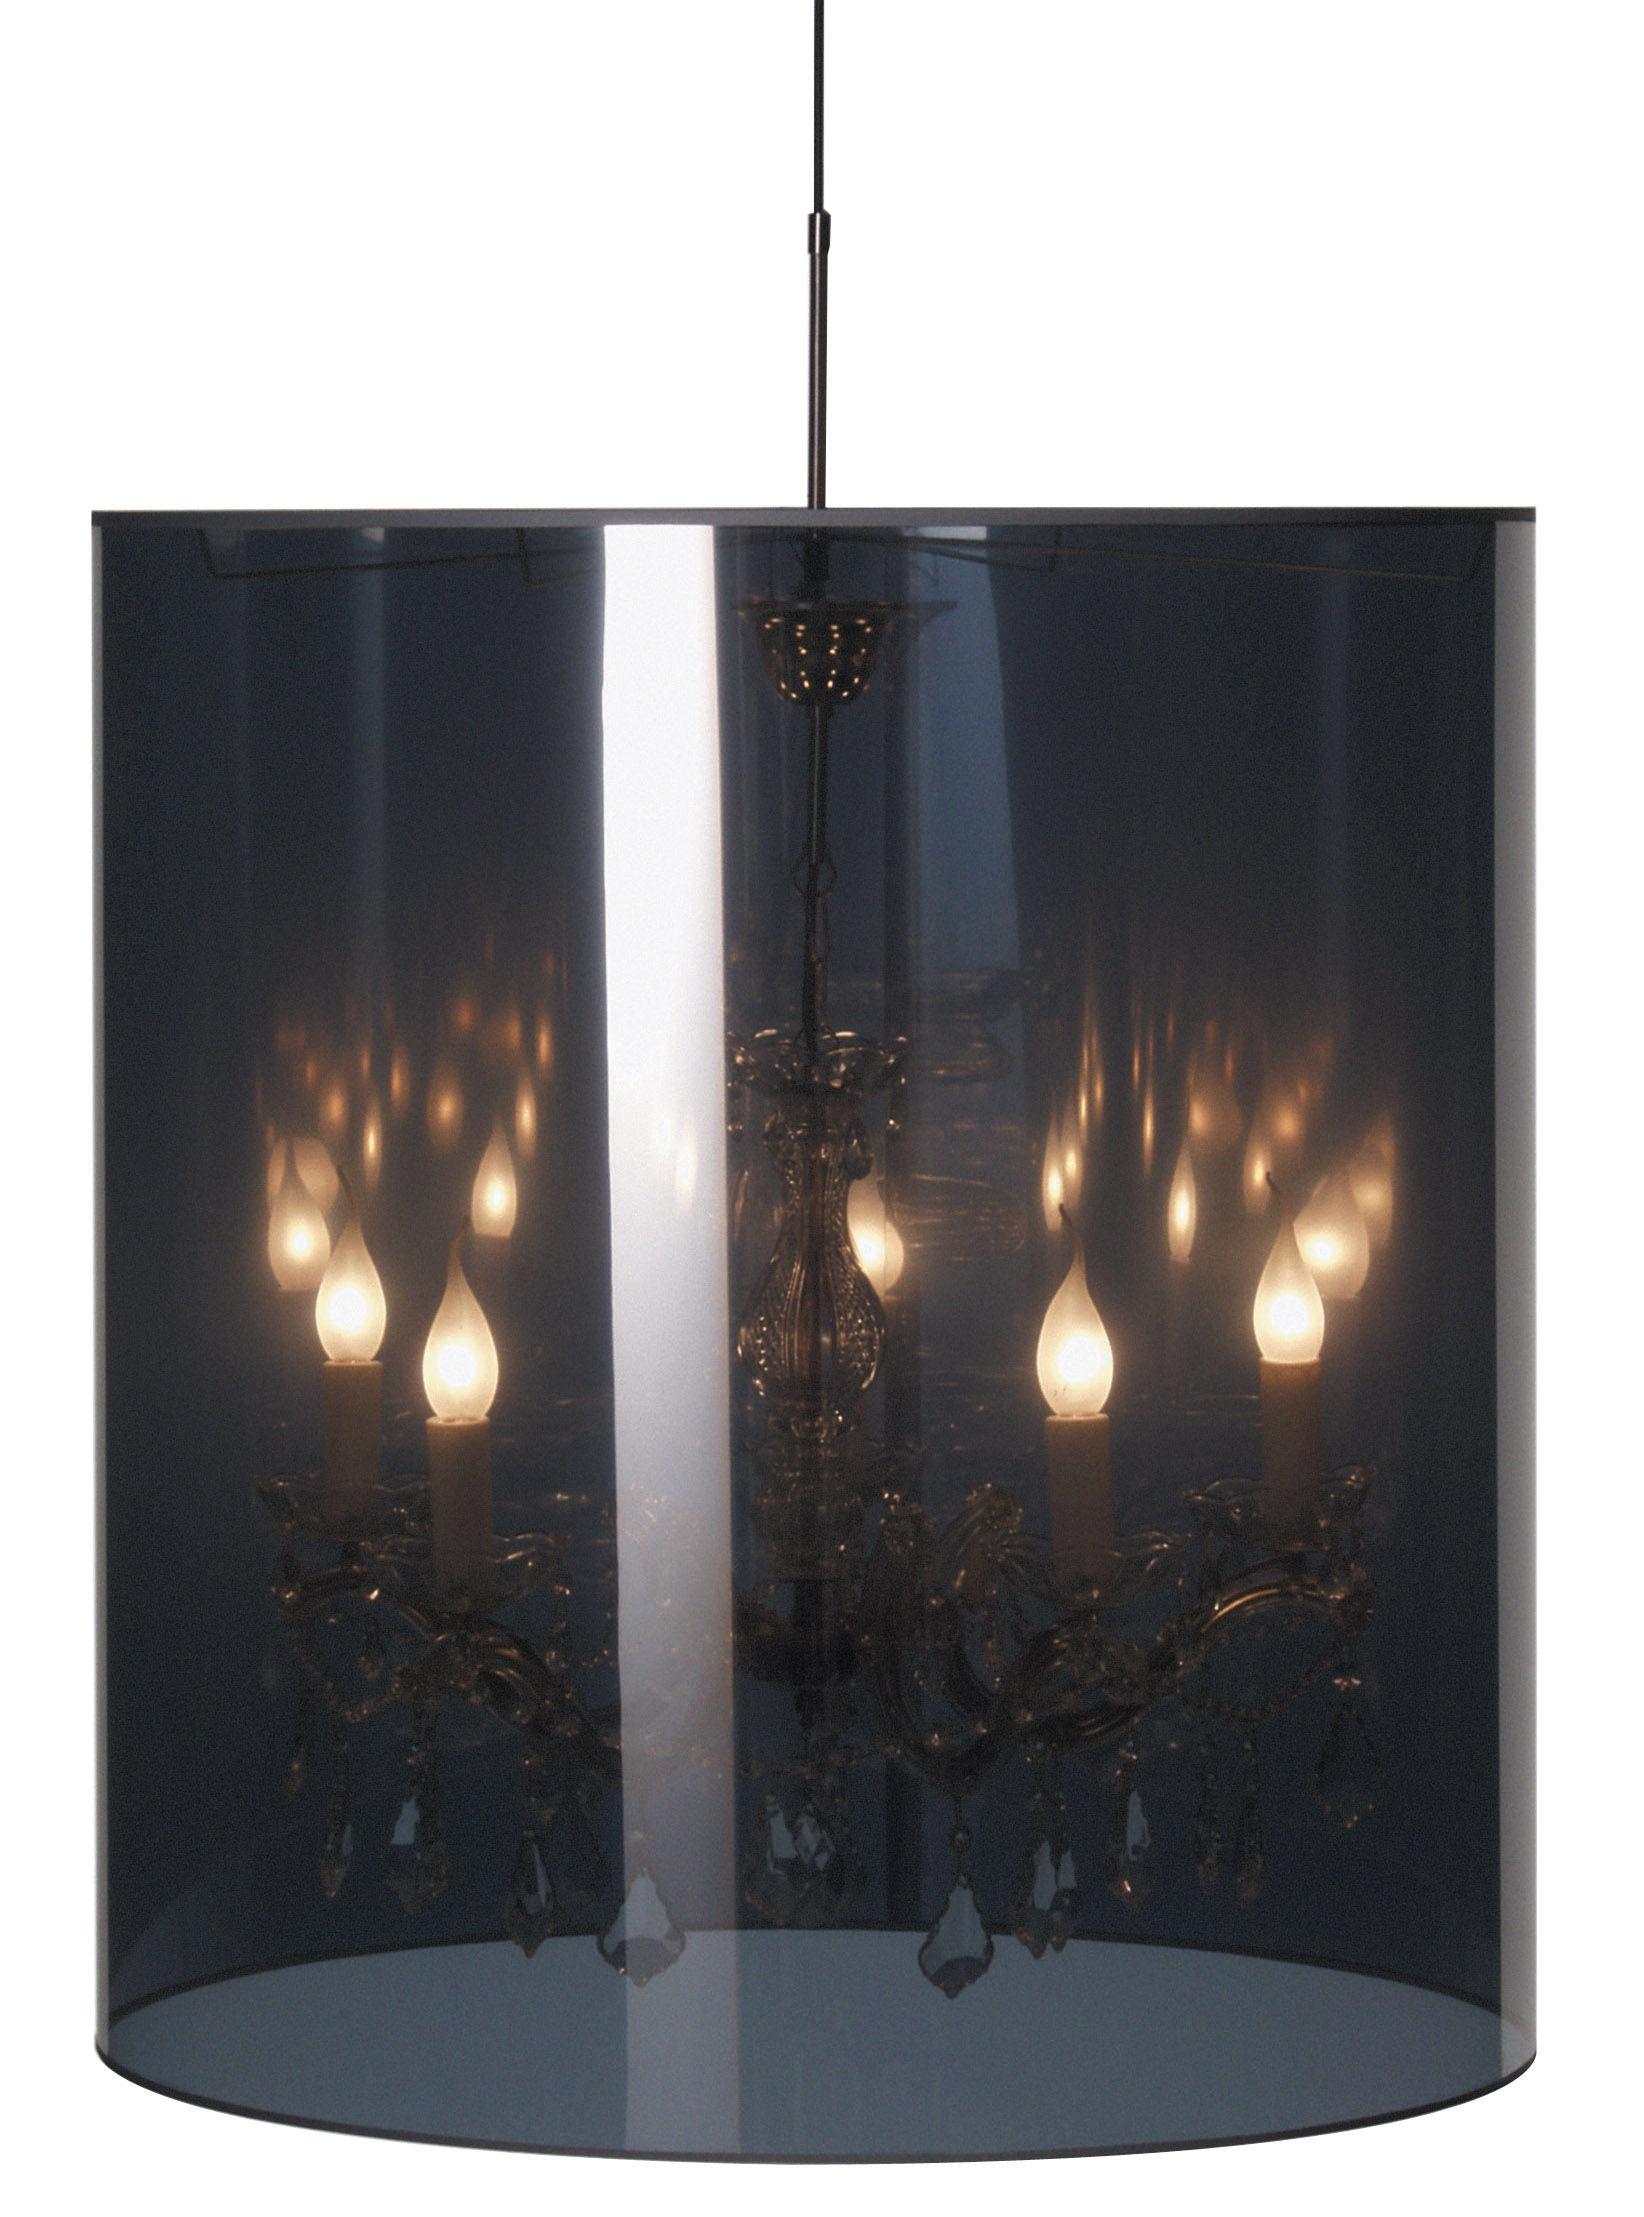 Lighting - Pendant Lighting - Light Shade Shade Pendant - Ø 70 cm by Moooi - Light fitting - Glass, Metal, Plastic material